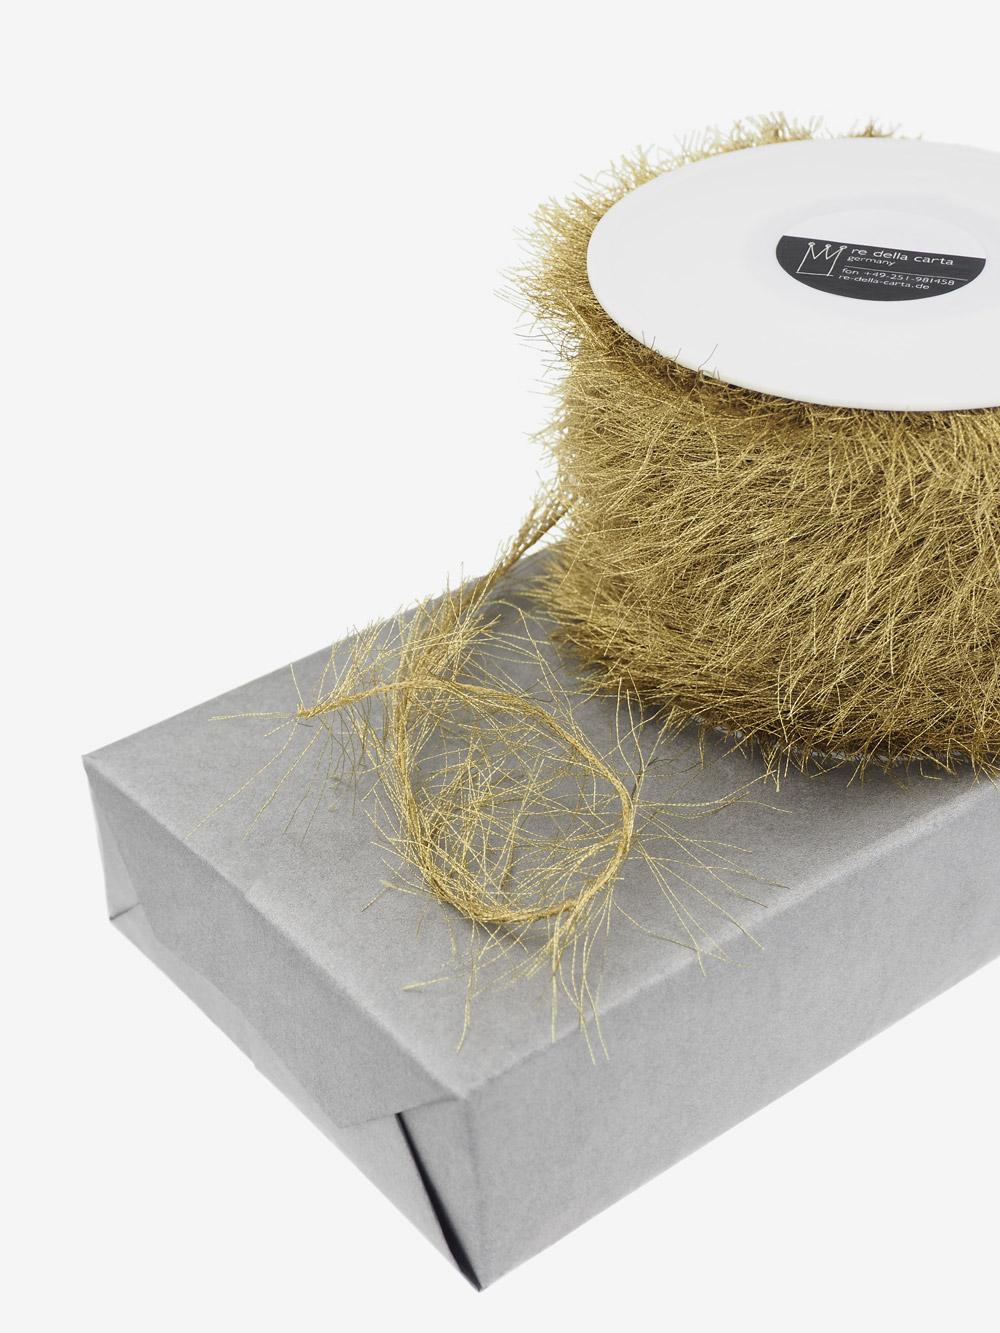 fransenband gold edel gl nzend f r weihnachtsp ckchen grossrolle. Black Bedroom Furniture Sets. Home Design Ideas